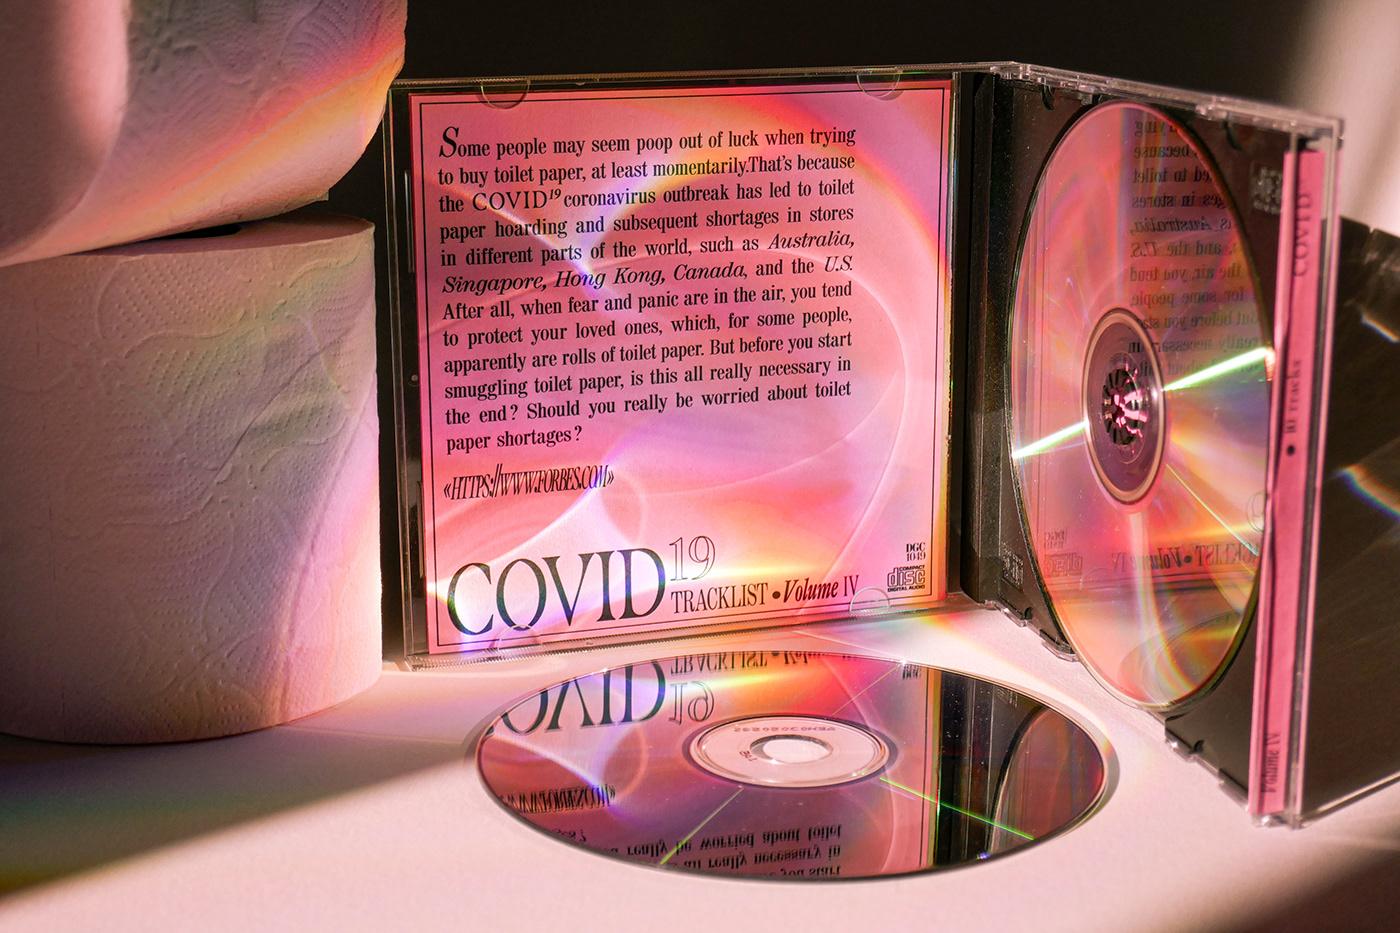 Album cd corona COVID-19 graphicdesign kitch miseenscene publicité toiletrolls Typographie